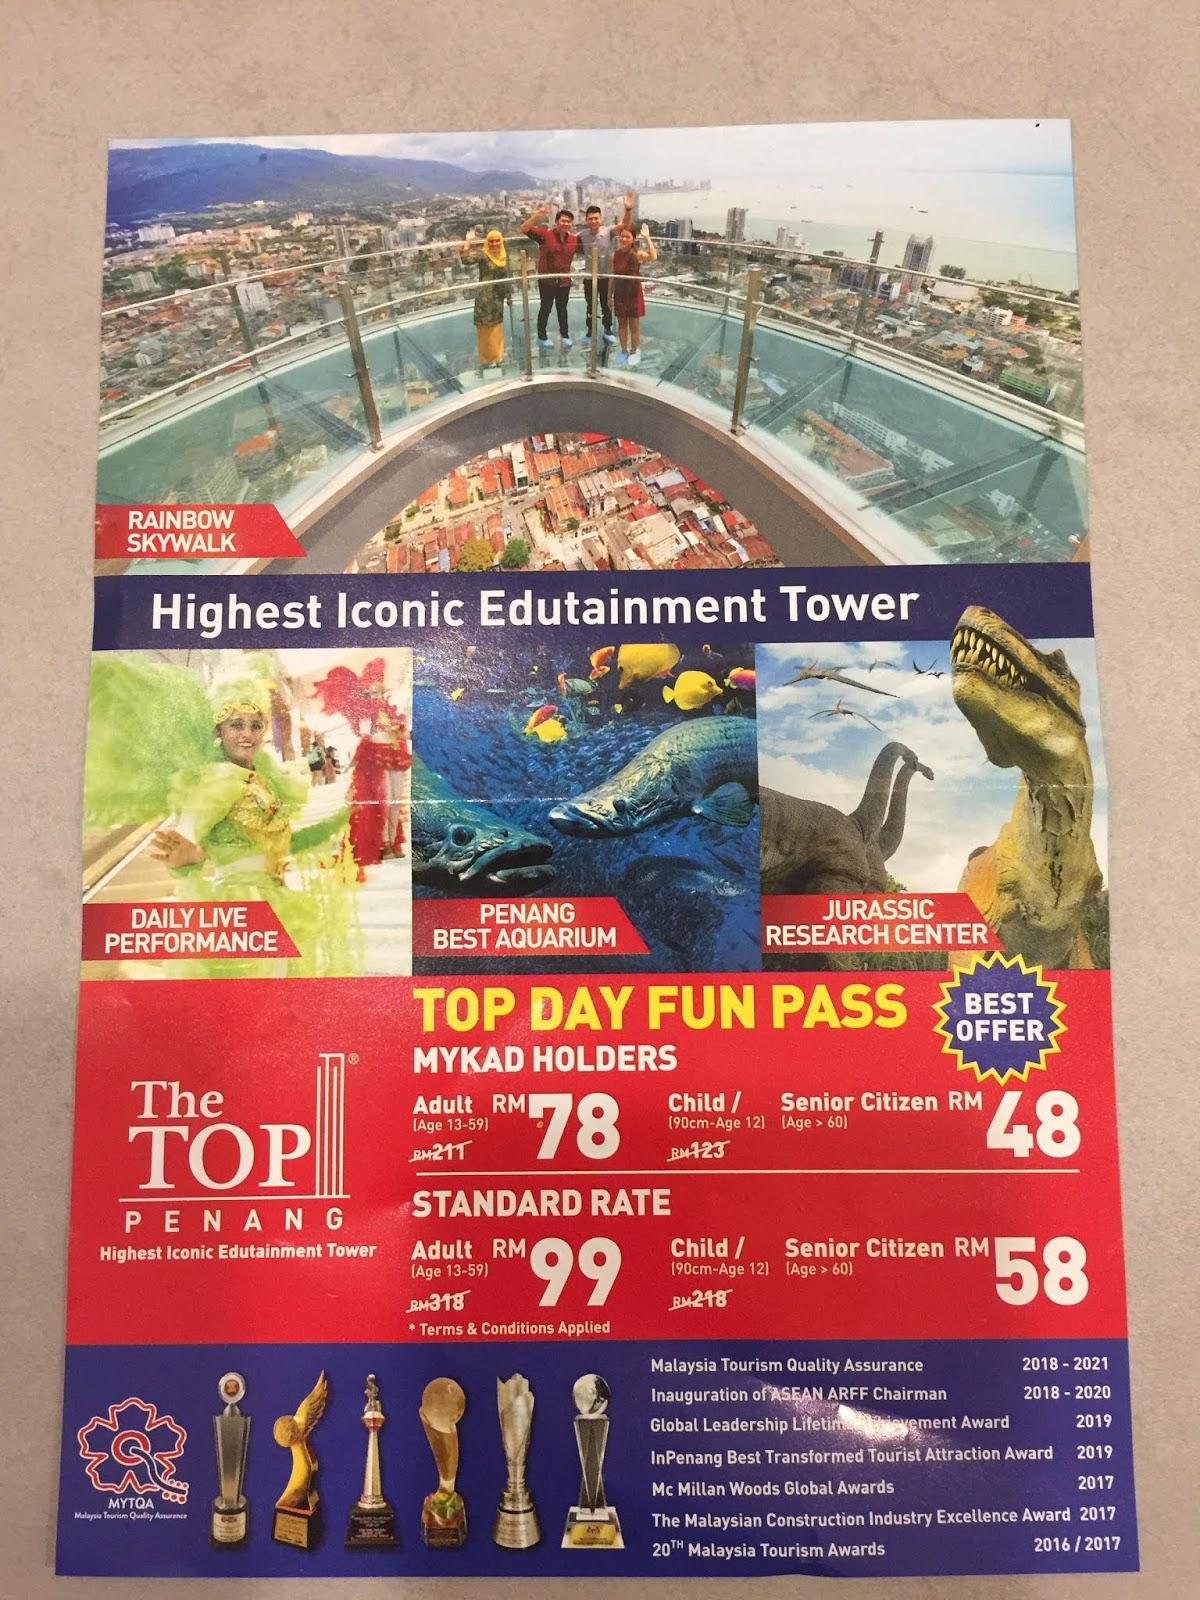 the top komtar, sky walk, top view promotion, top view restaurant